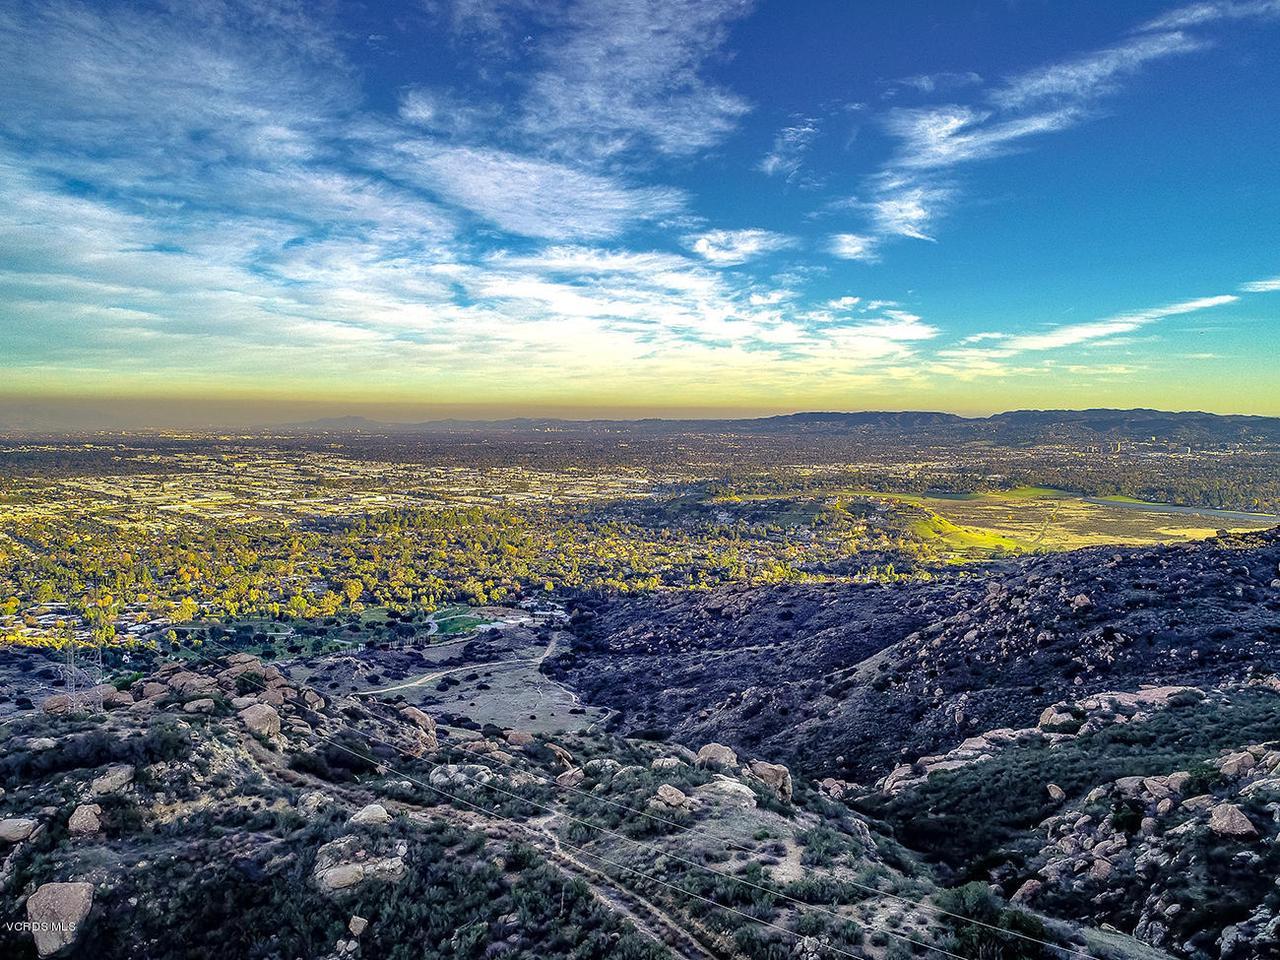 7868 MESA, Simi Valley, CA 93063 - Aerials-10